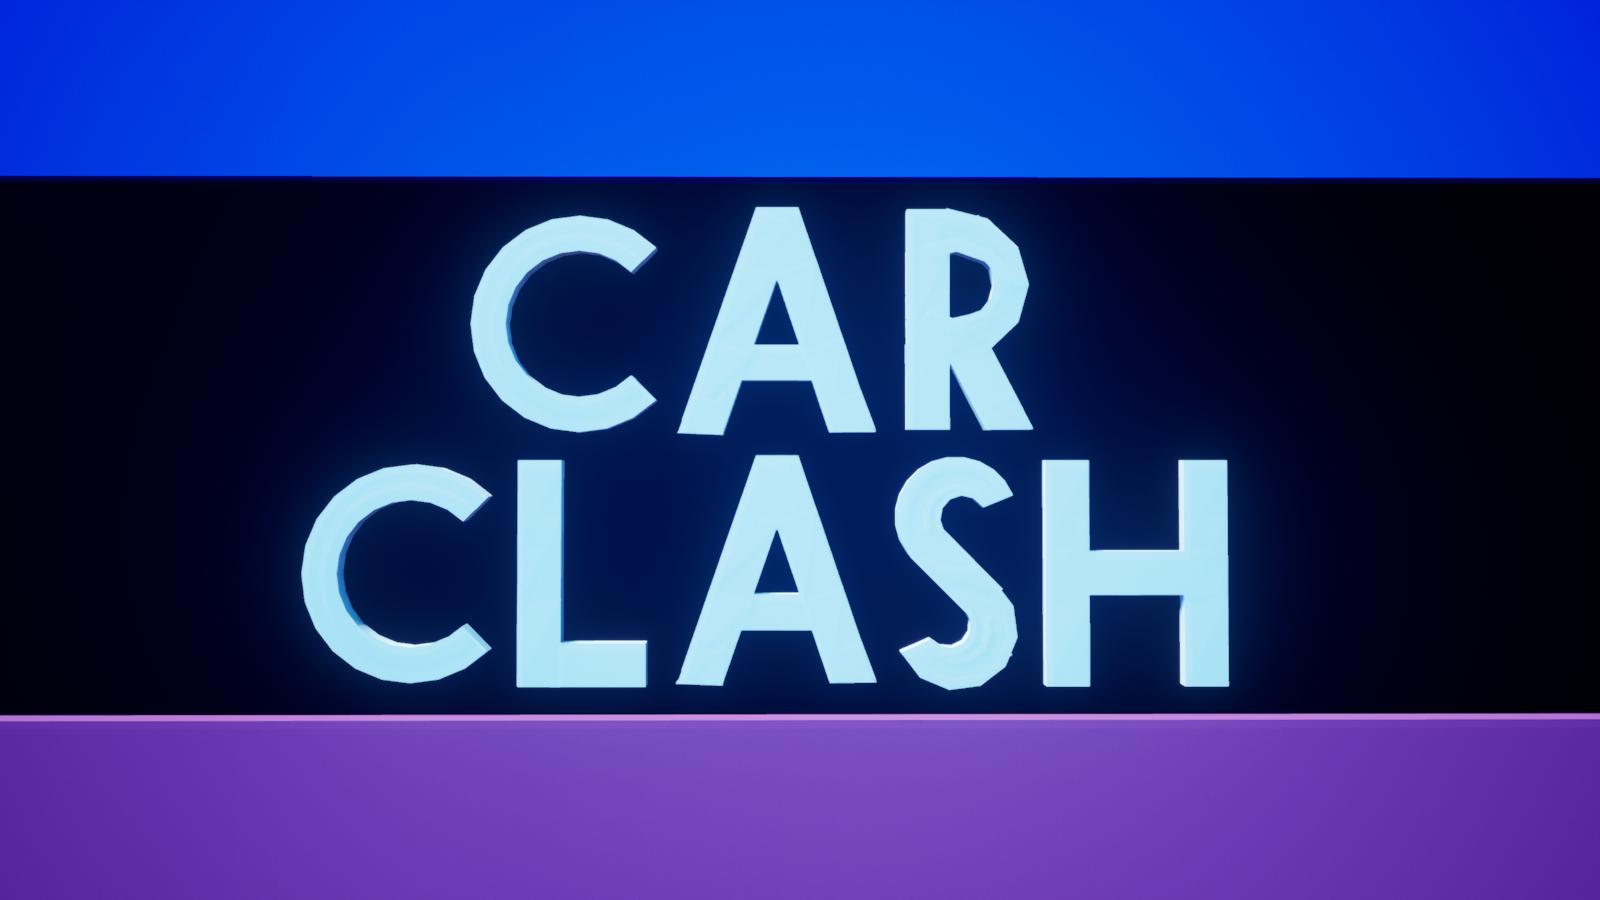 Car Clash 1992-8632-6425 by electriccloud55